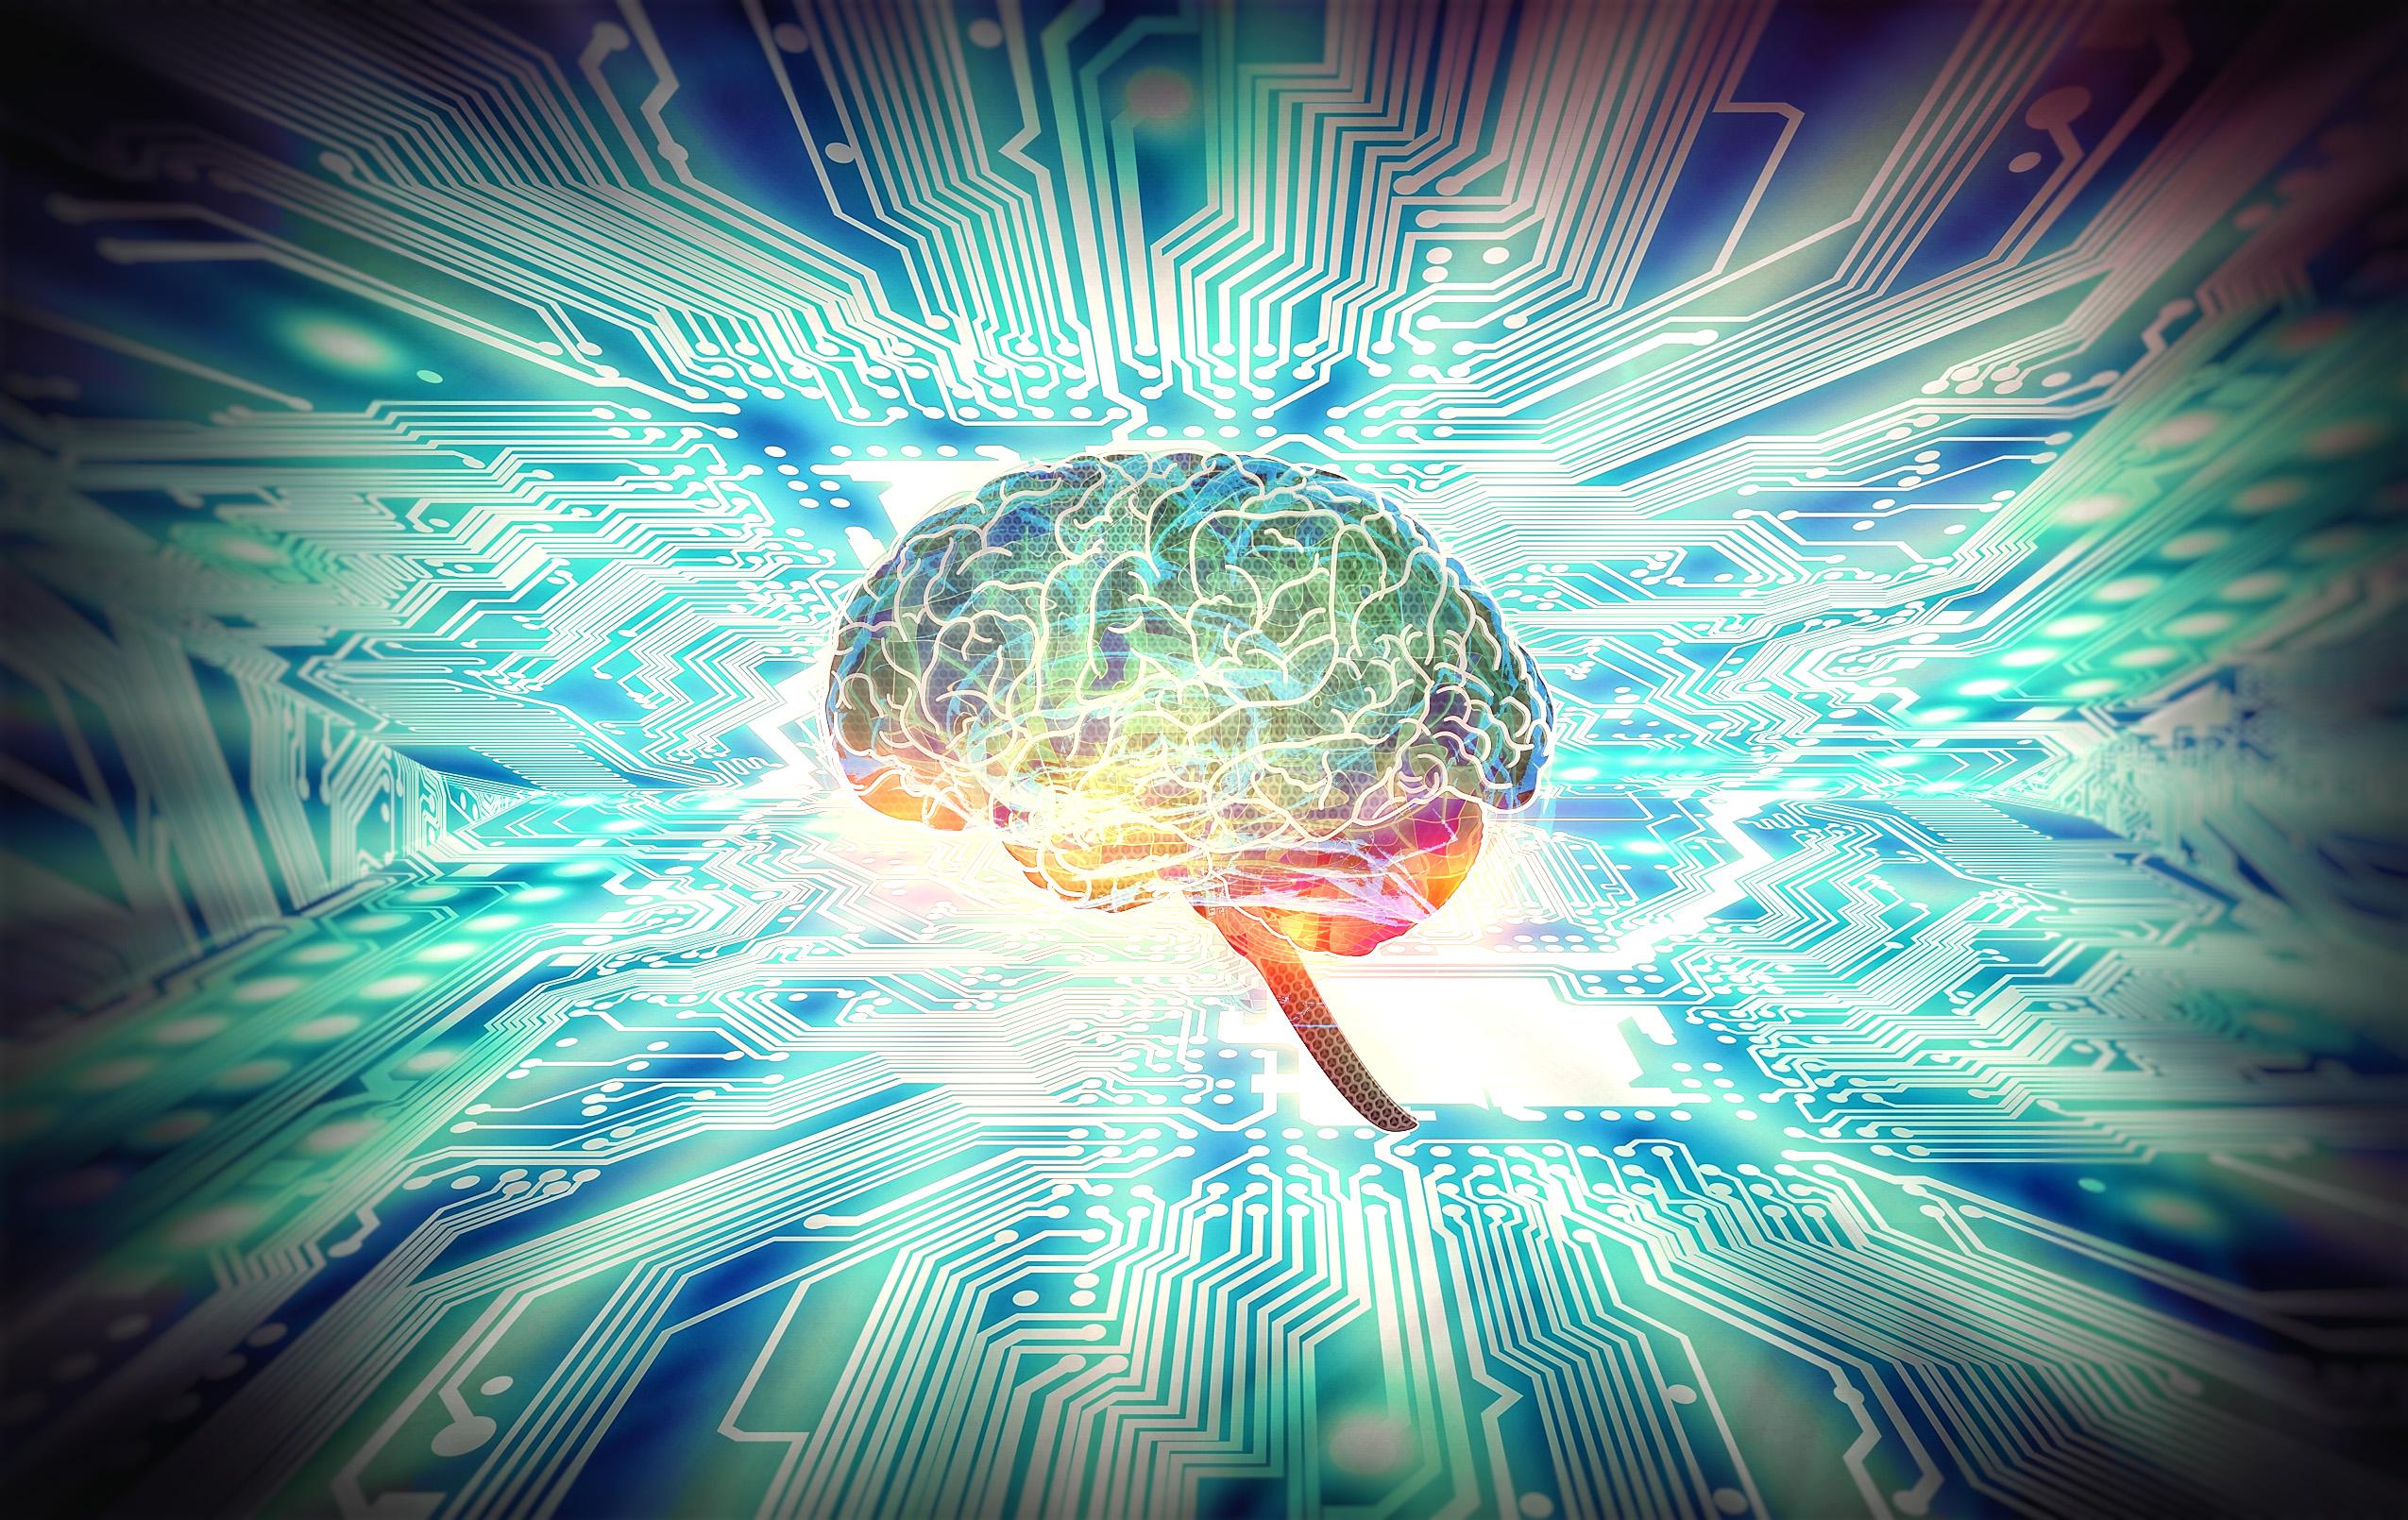 stockvault-artificial-intelligence-concept-robotic-brain197026